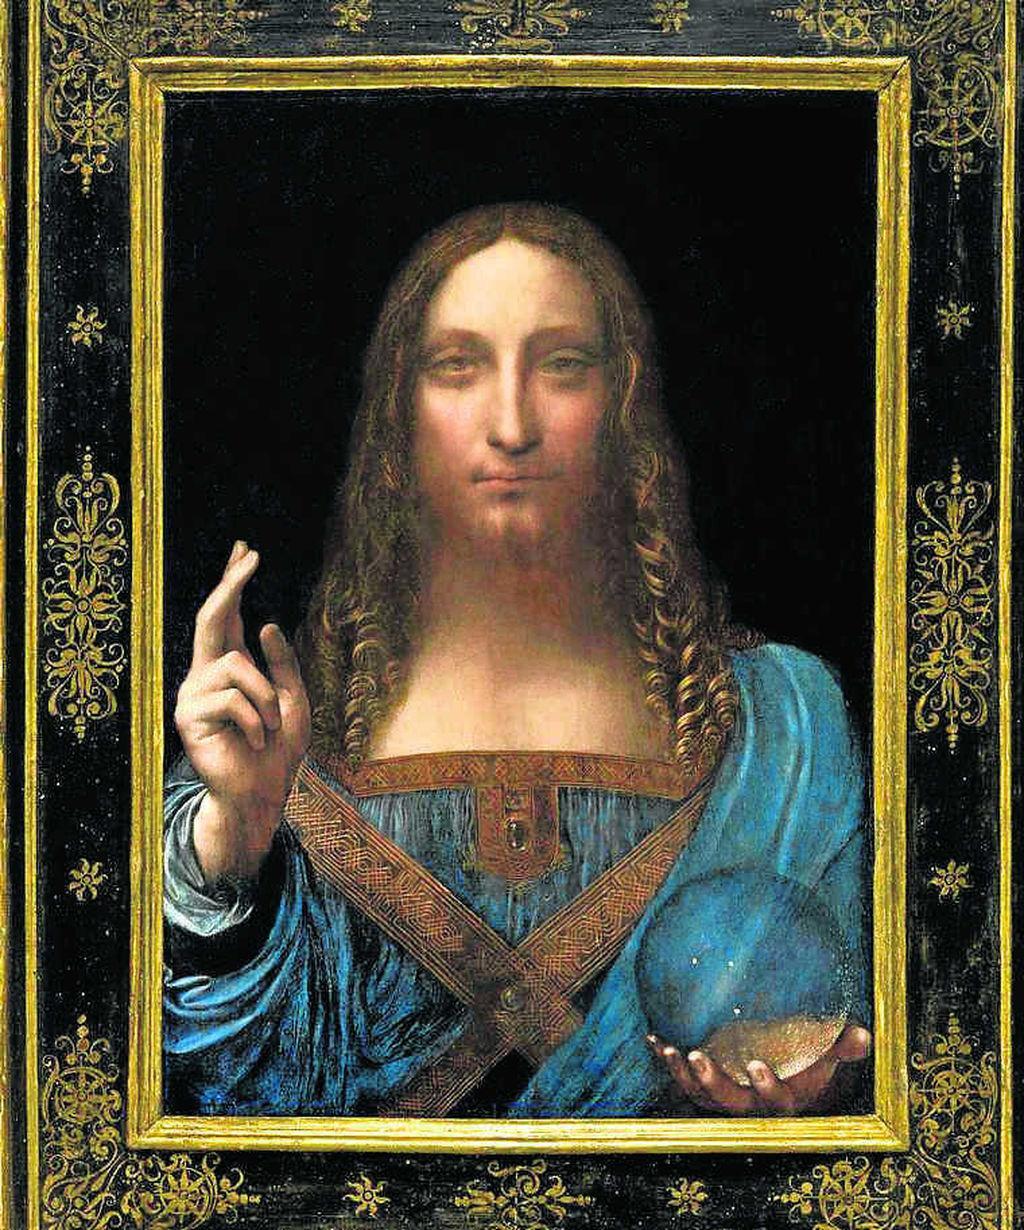 Pintura podría no ser de Leonardo Da vinci